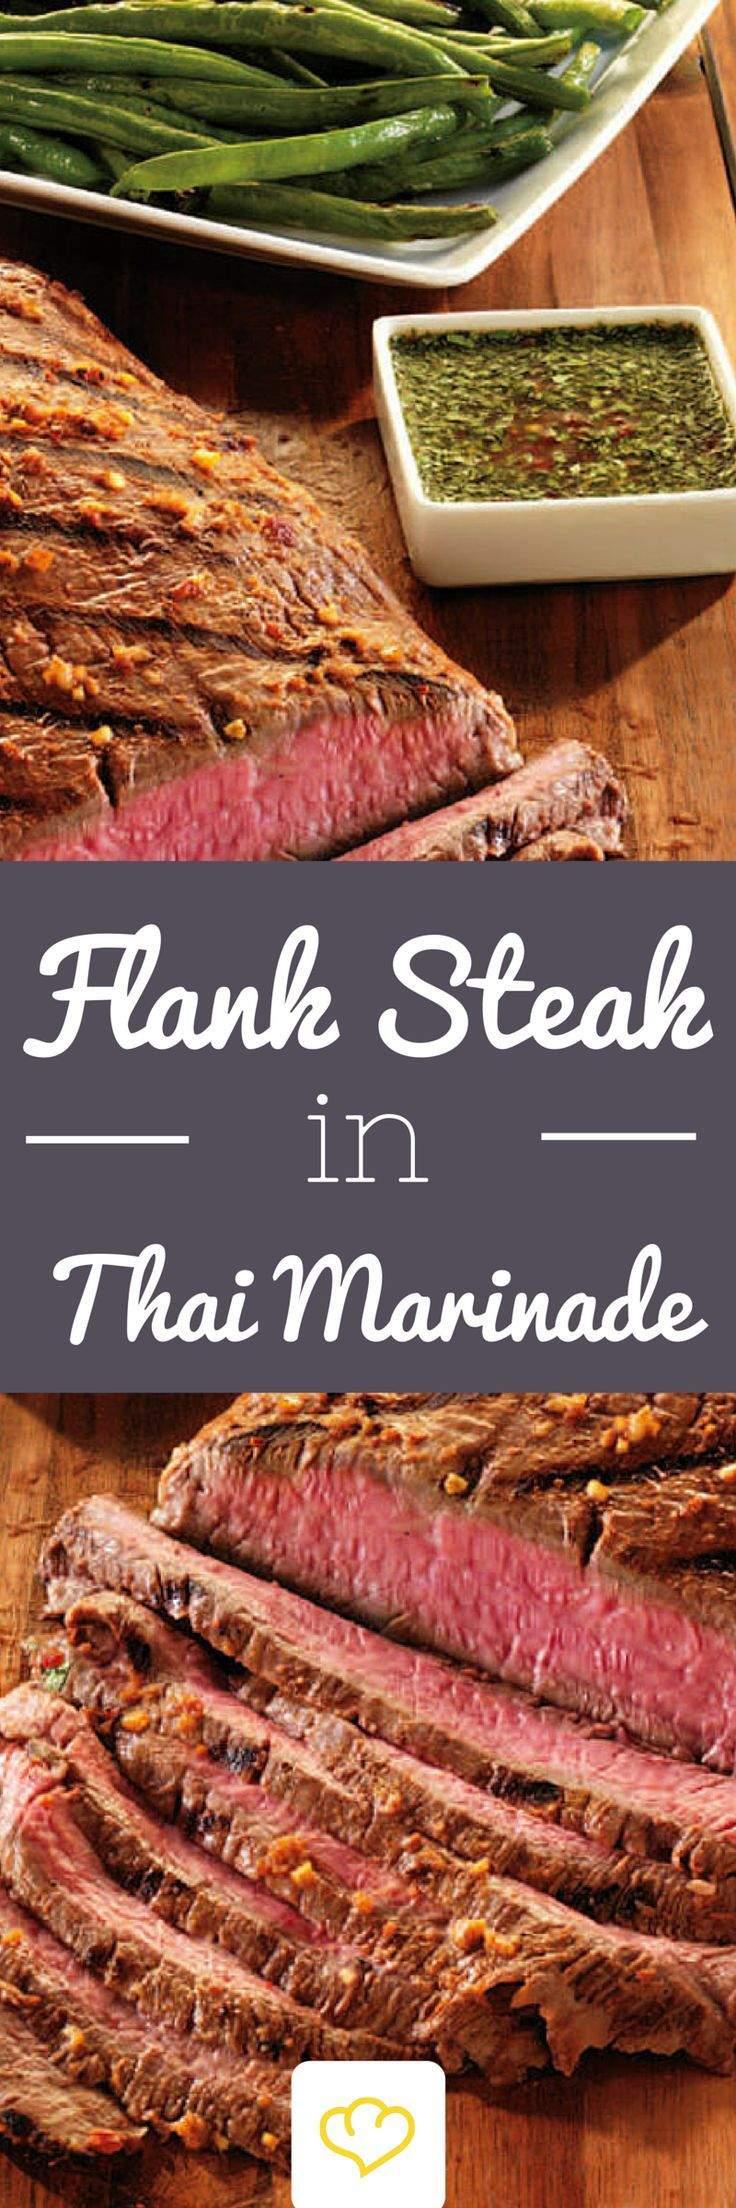 170df85a0b6180e76f4b188fc2c6fc69 sambal oelek flank steak